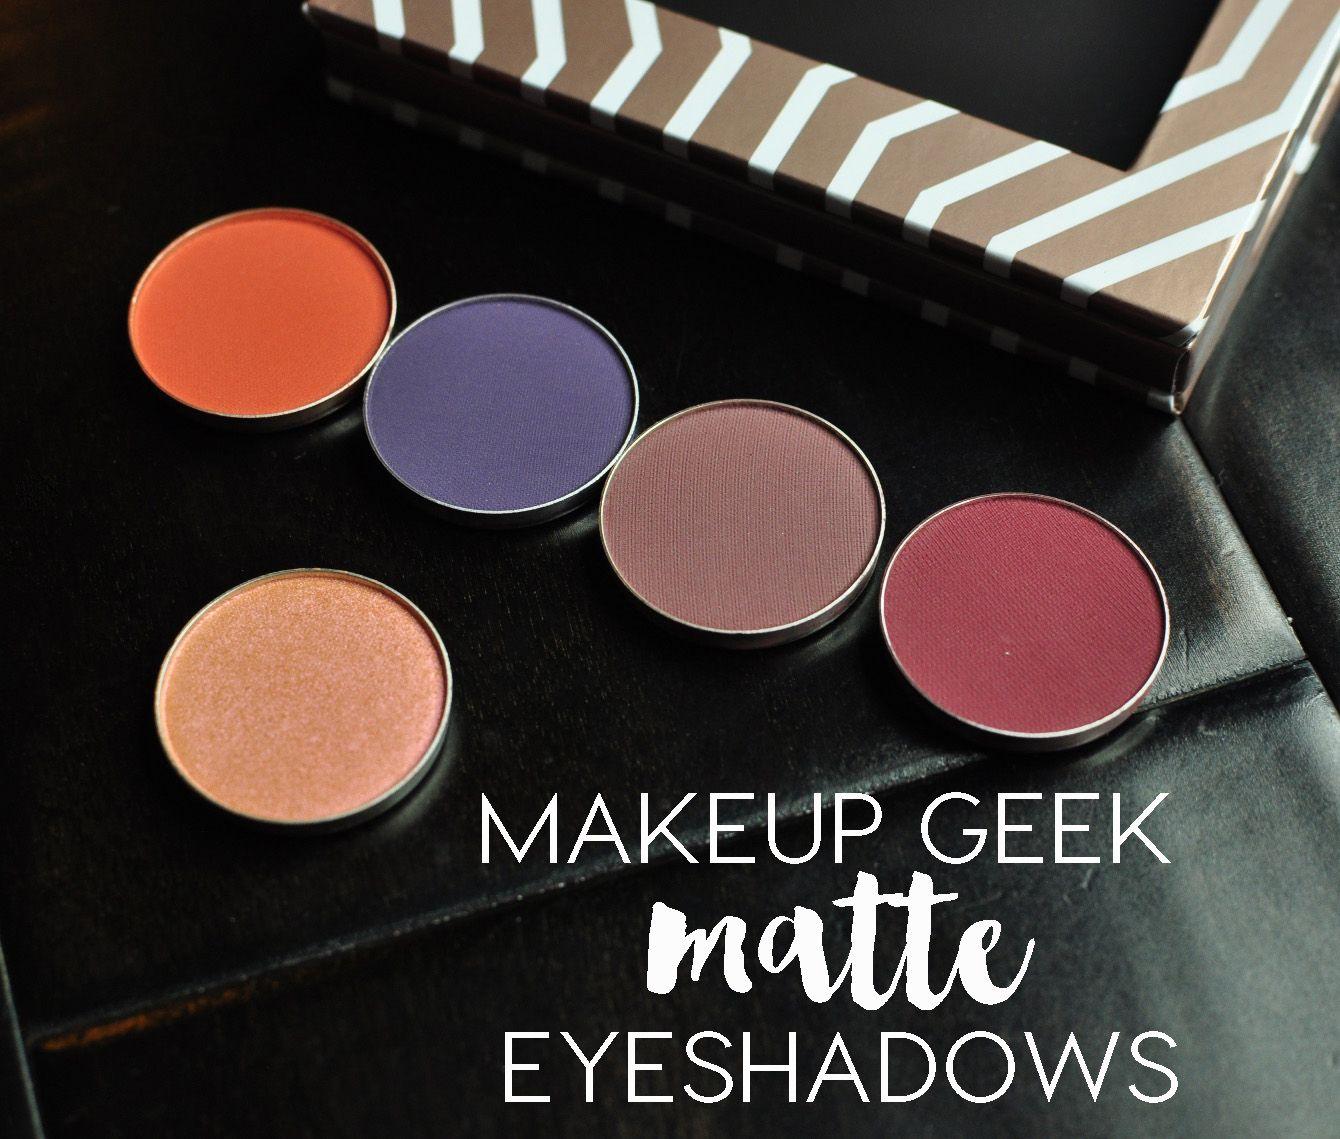 Makeup Geek Matte Eyeshadows Review Makeup geek